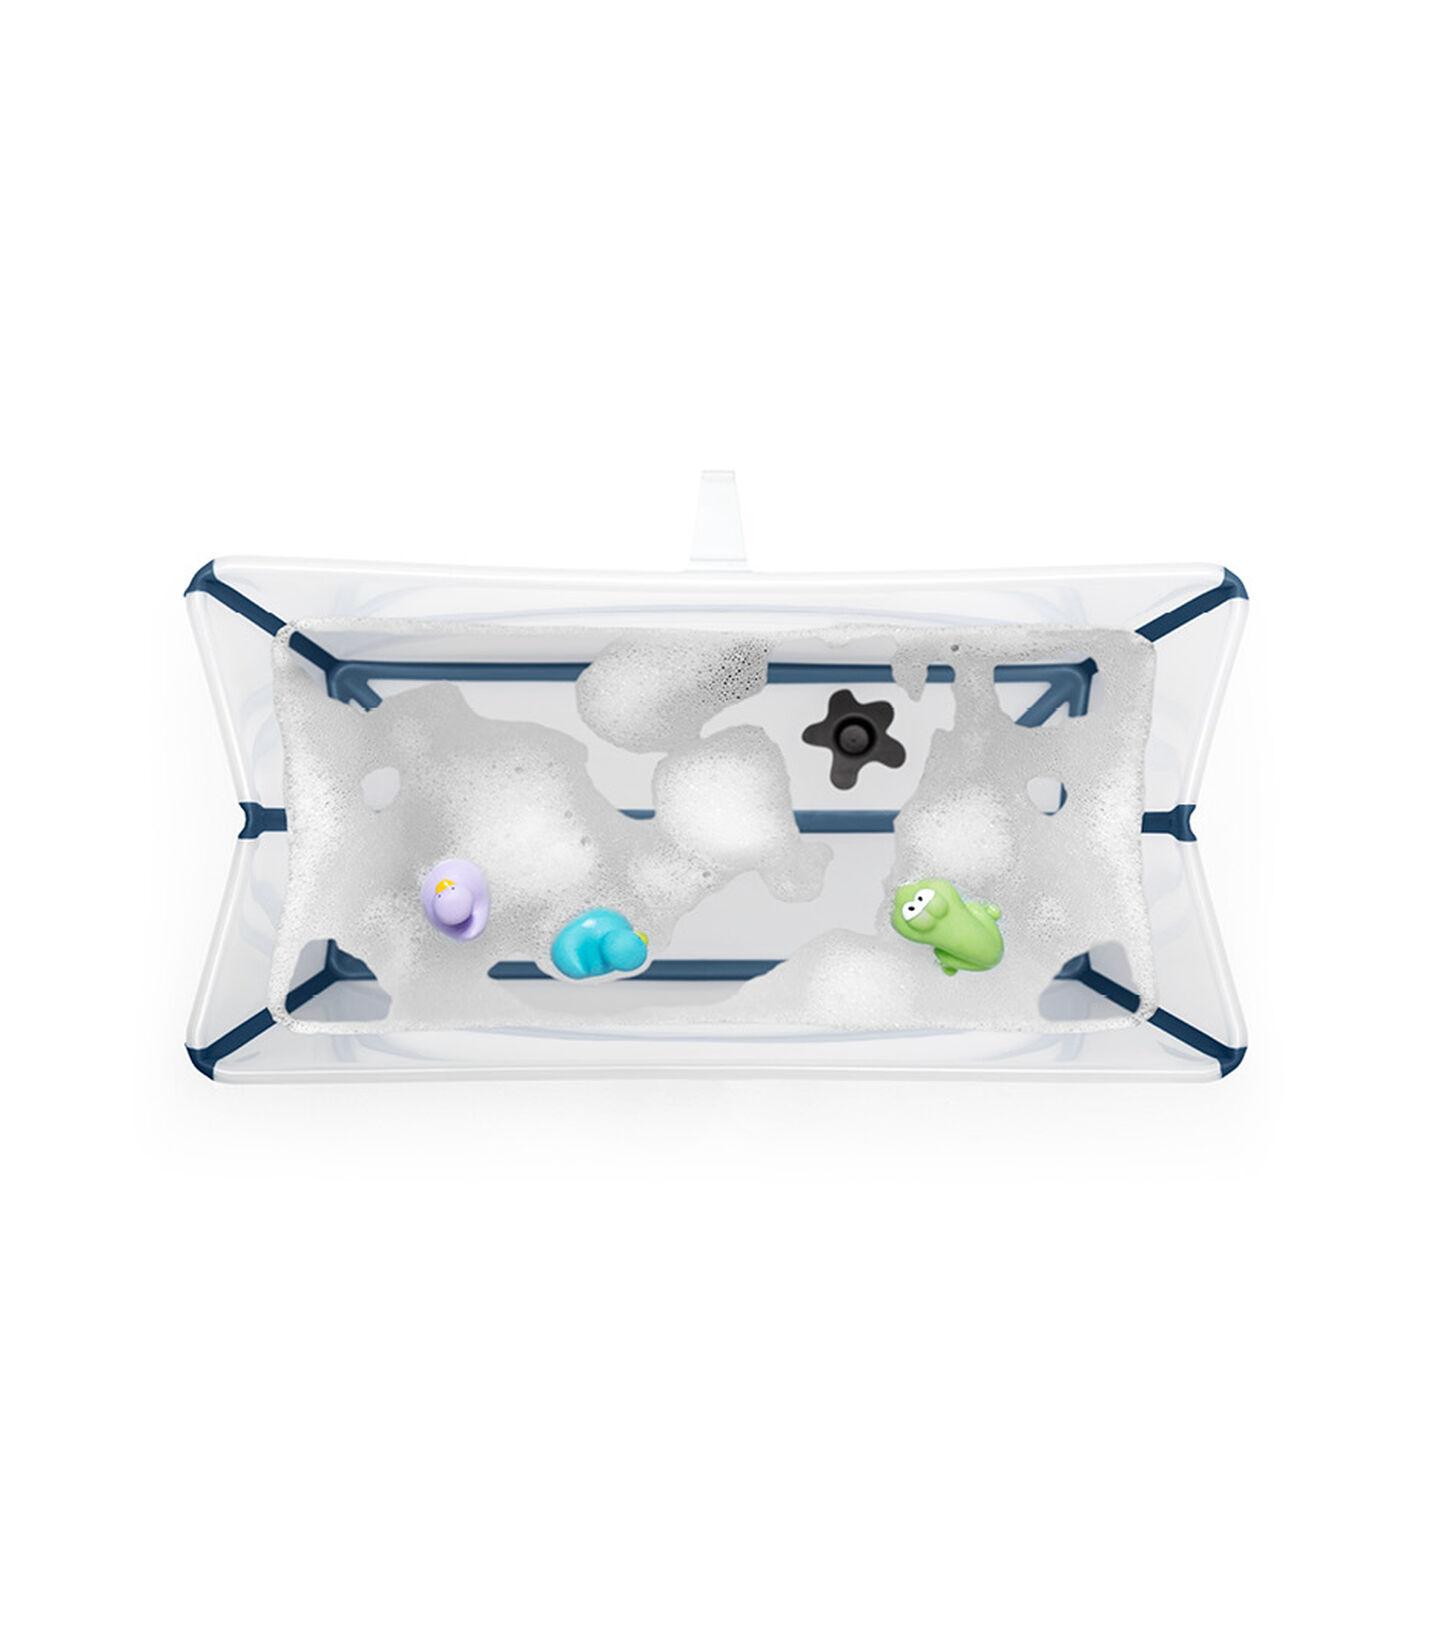 Stokke® Flexi Bath ® Large White Aqua, Transparent bleu, mainview view 3